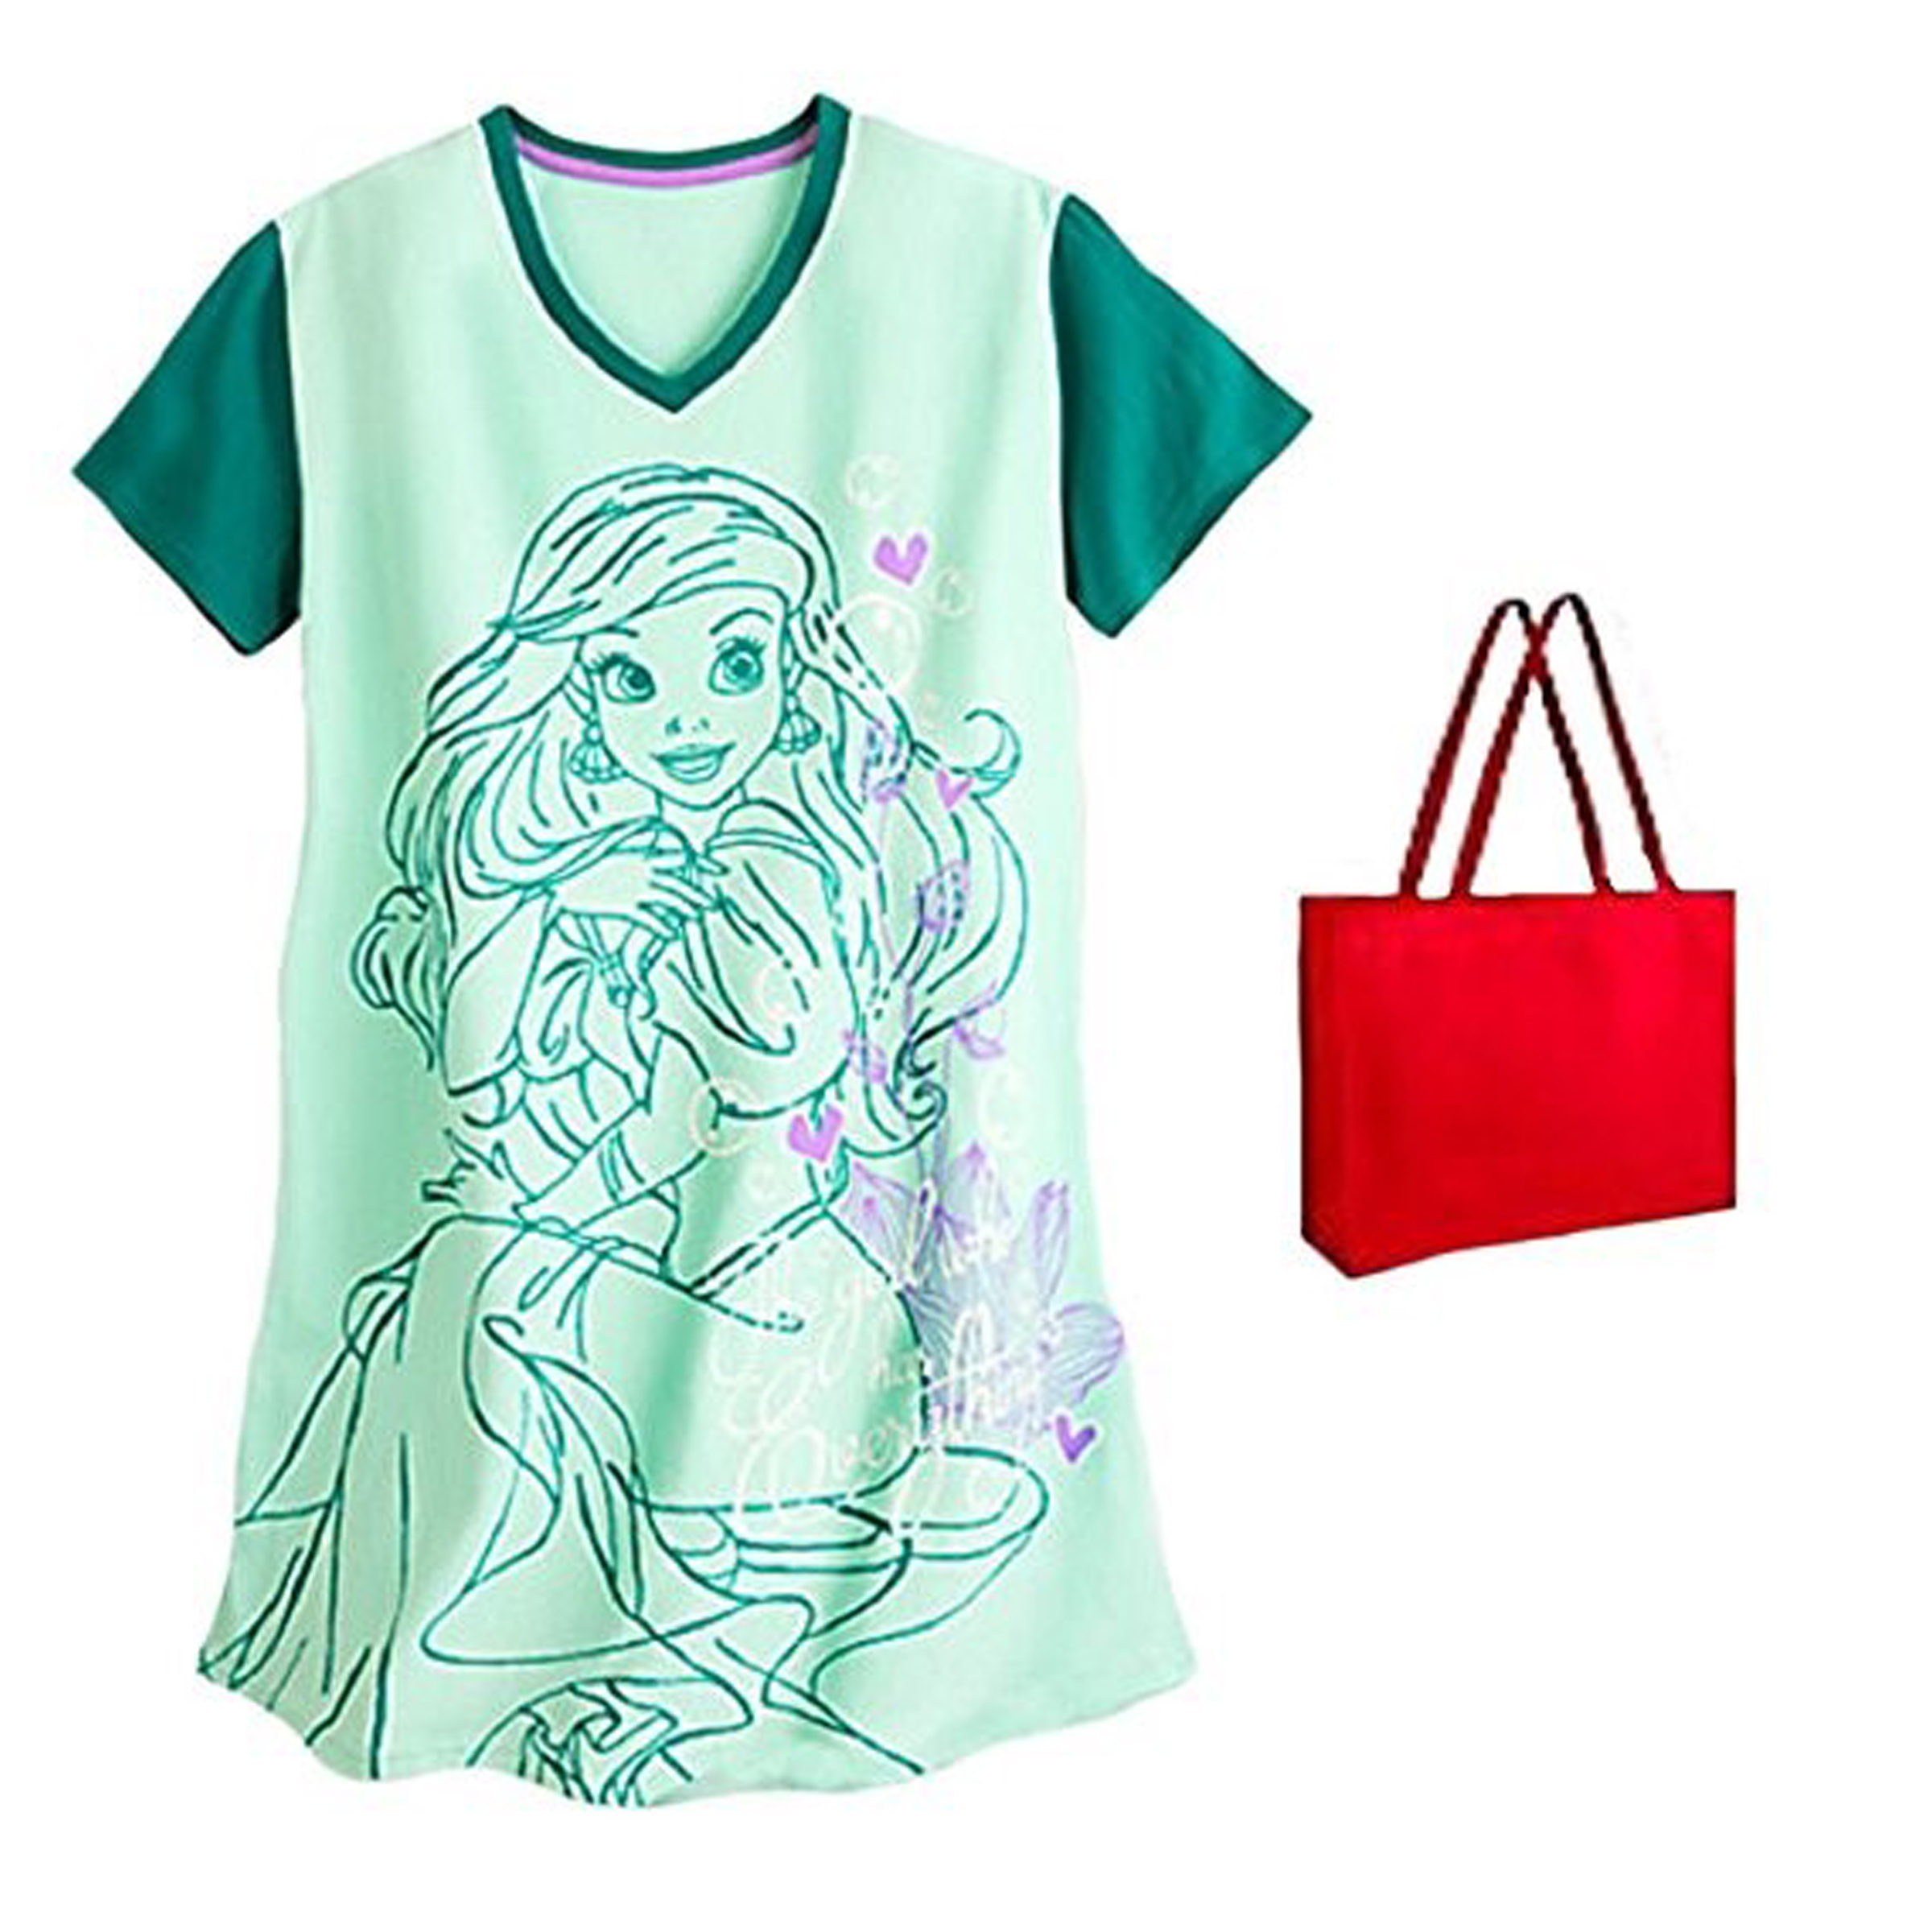 Disney The Little Mermaid Ariel Womens' Nightshirt & Tote - 2 Piece Gift Set